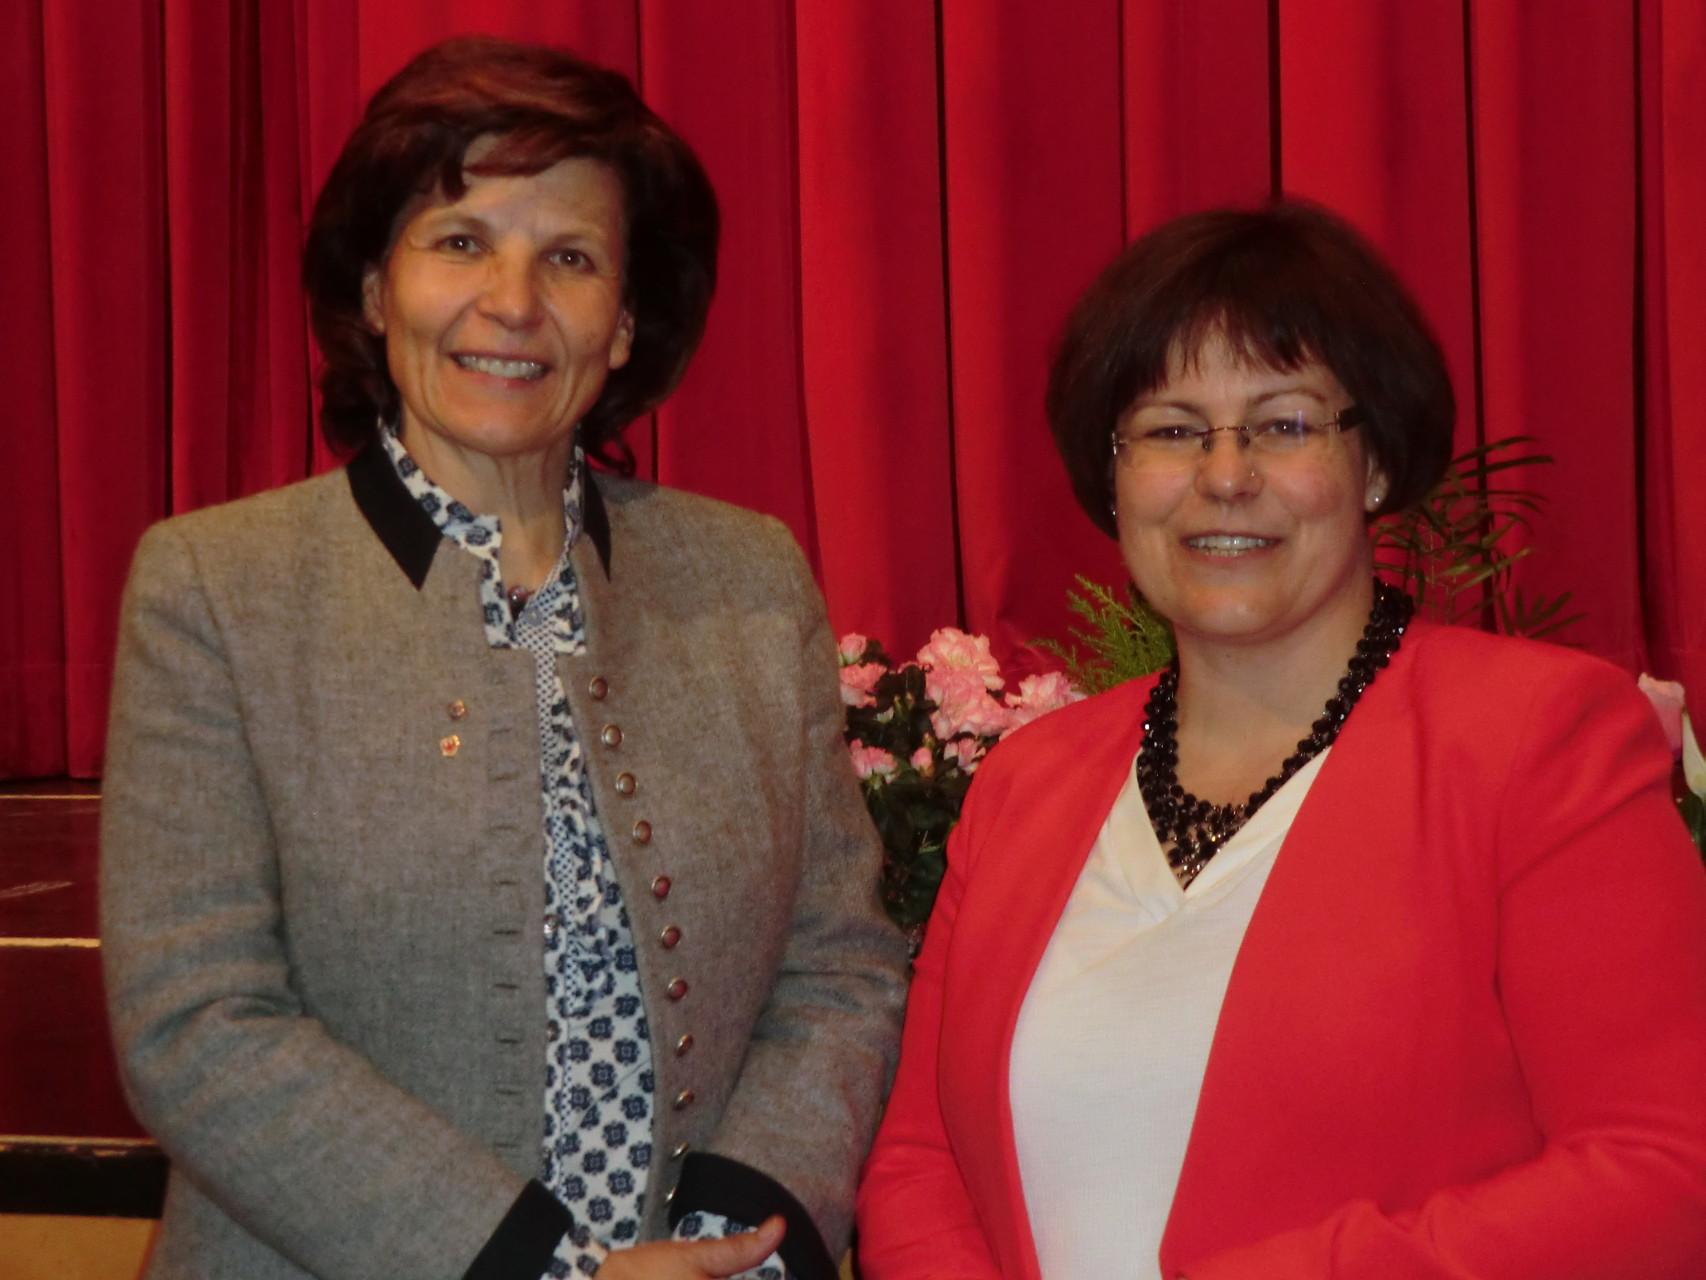 Hauptreferentin Maria Hochgruber Kuenzer